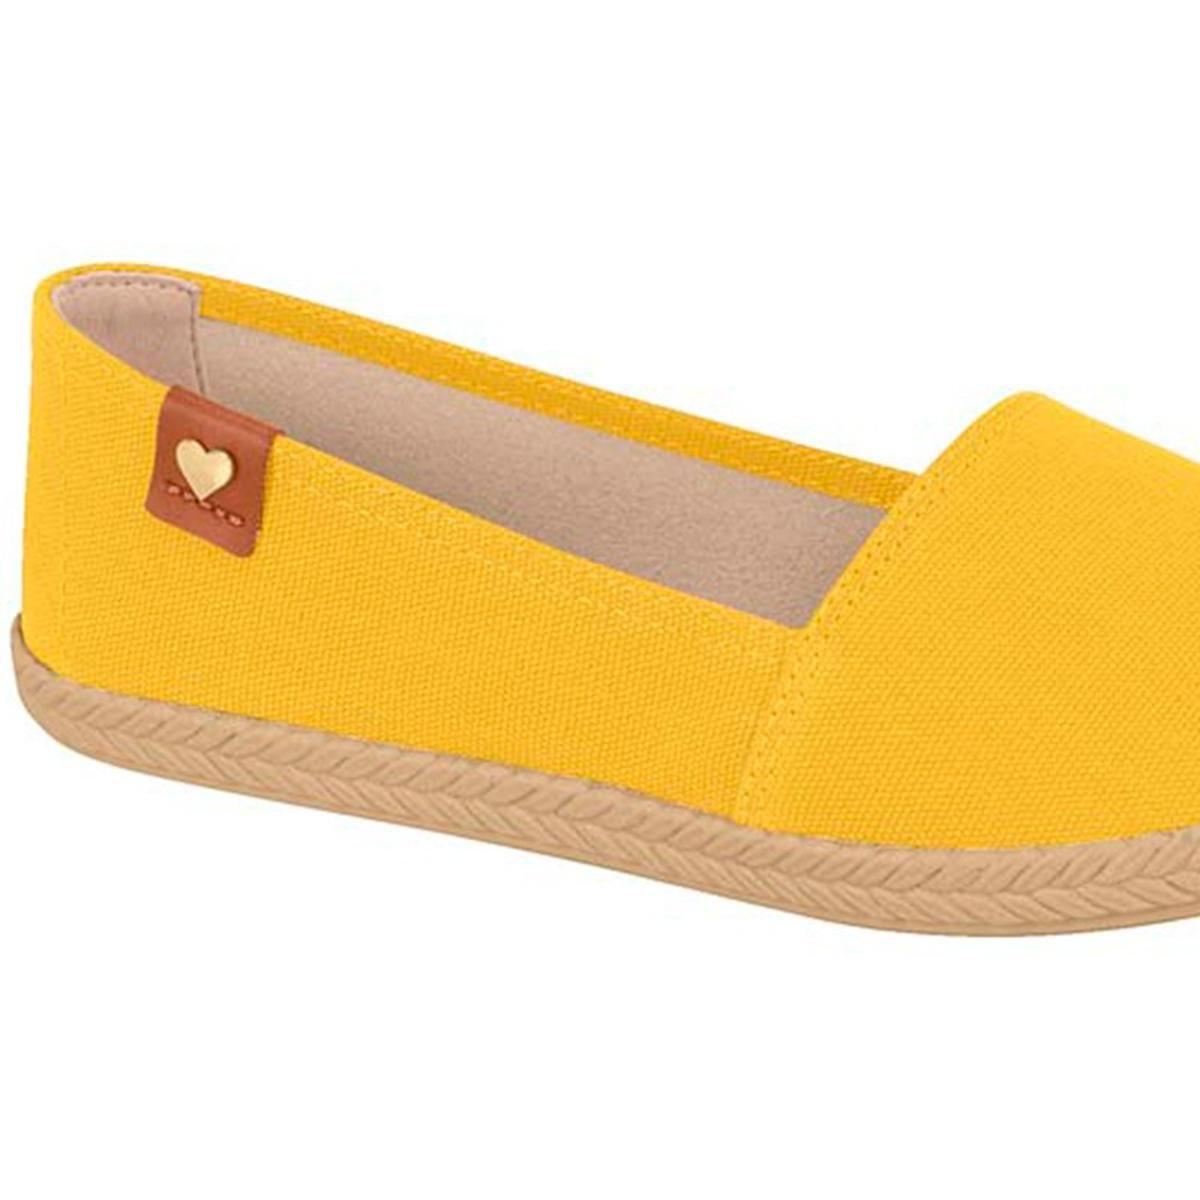 Sapatilha Moleca Lona Feminina - Amarelo